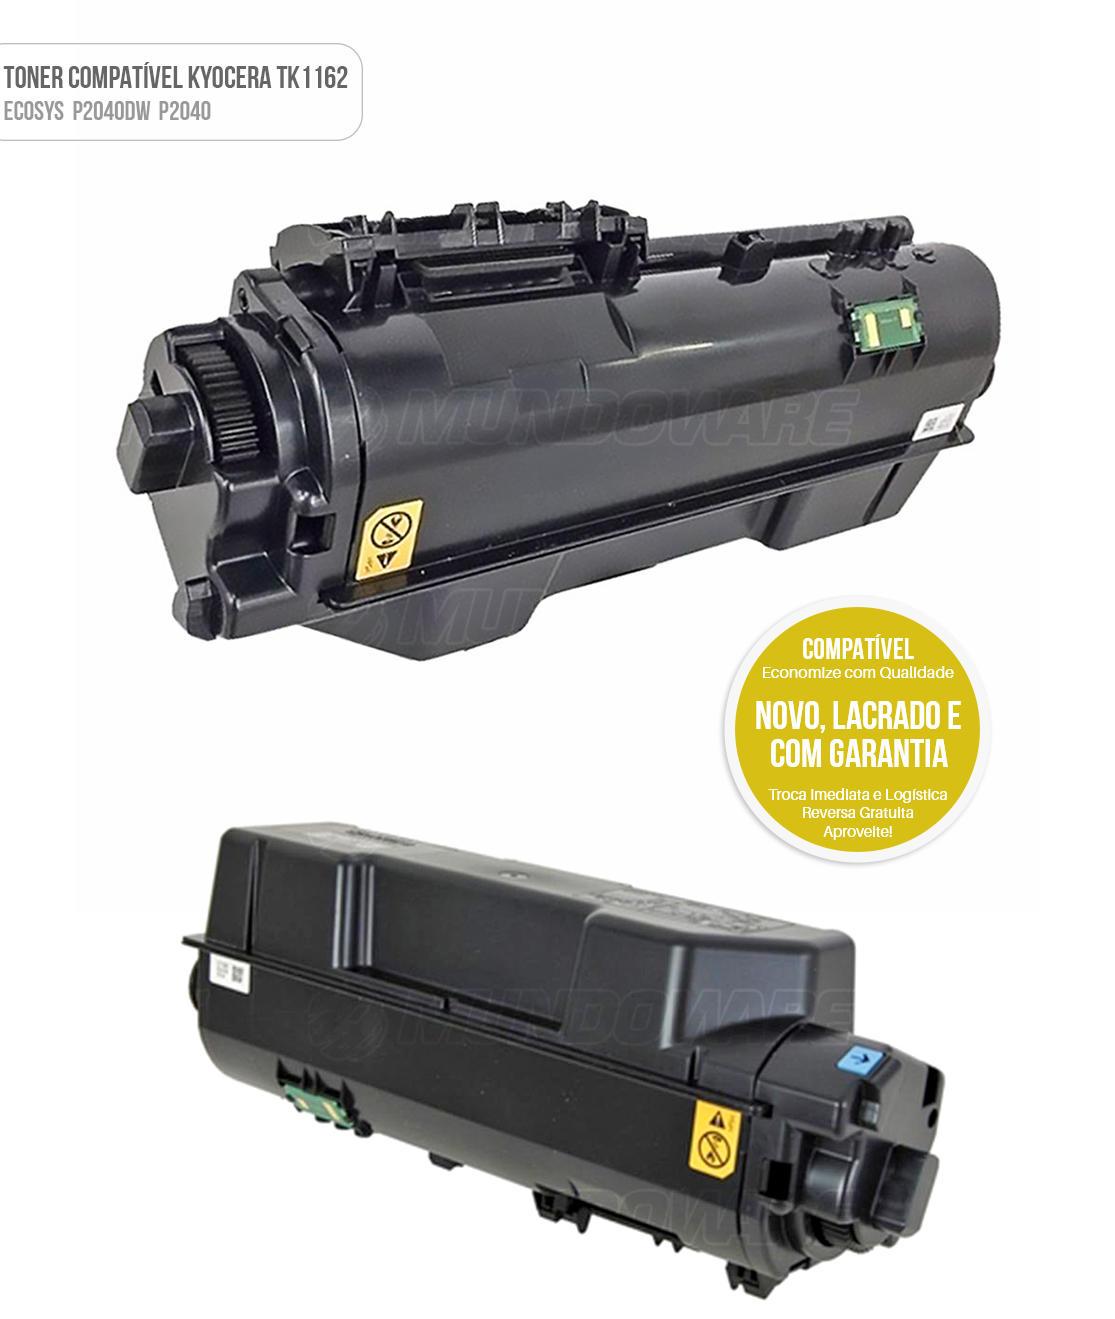 Toner Compatível TK1162 TK-1162 para Impressora Kyocera Ecosys P2040dw P2040 Tonner